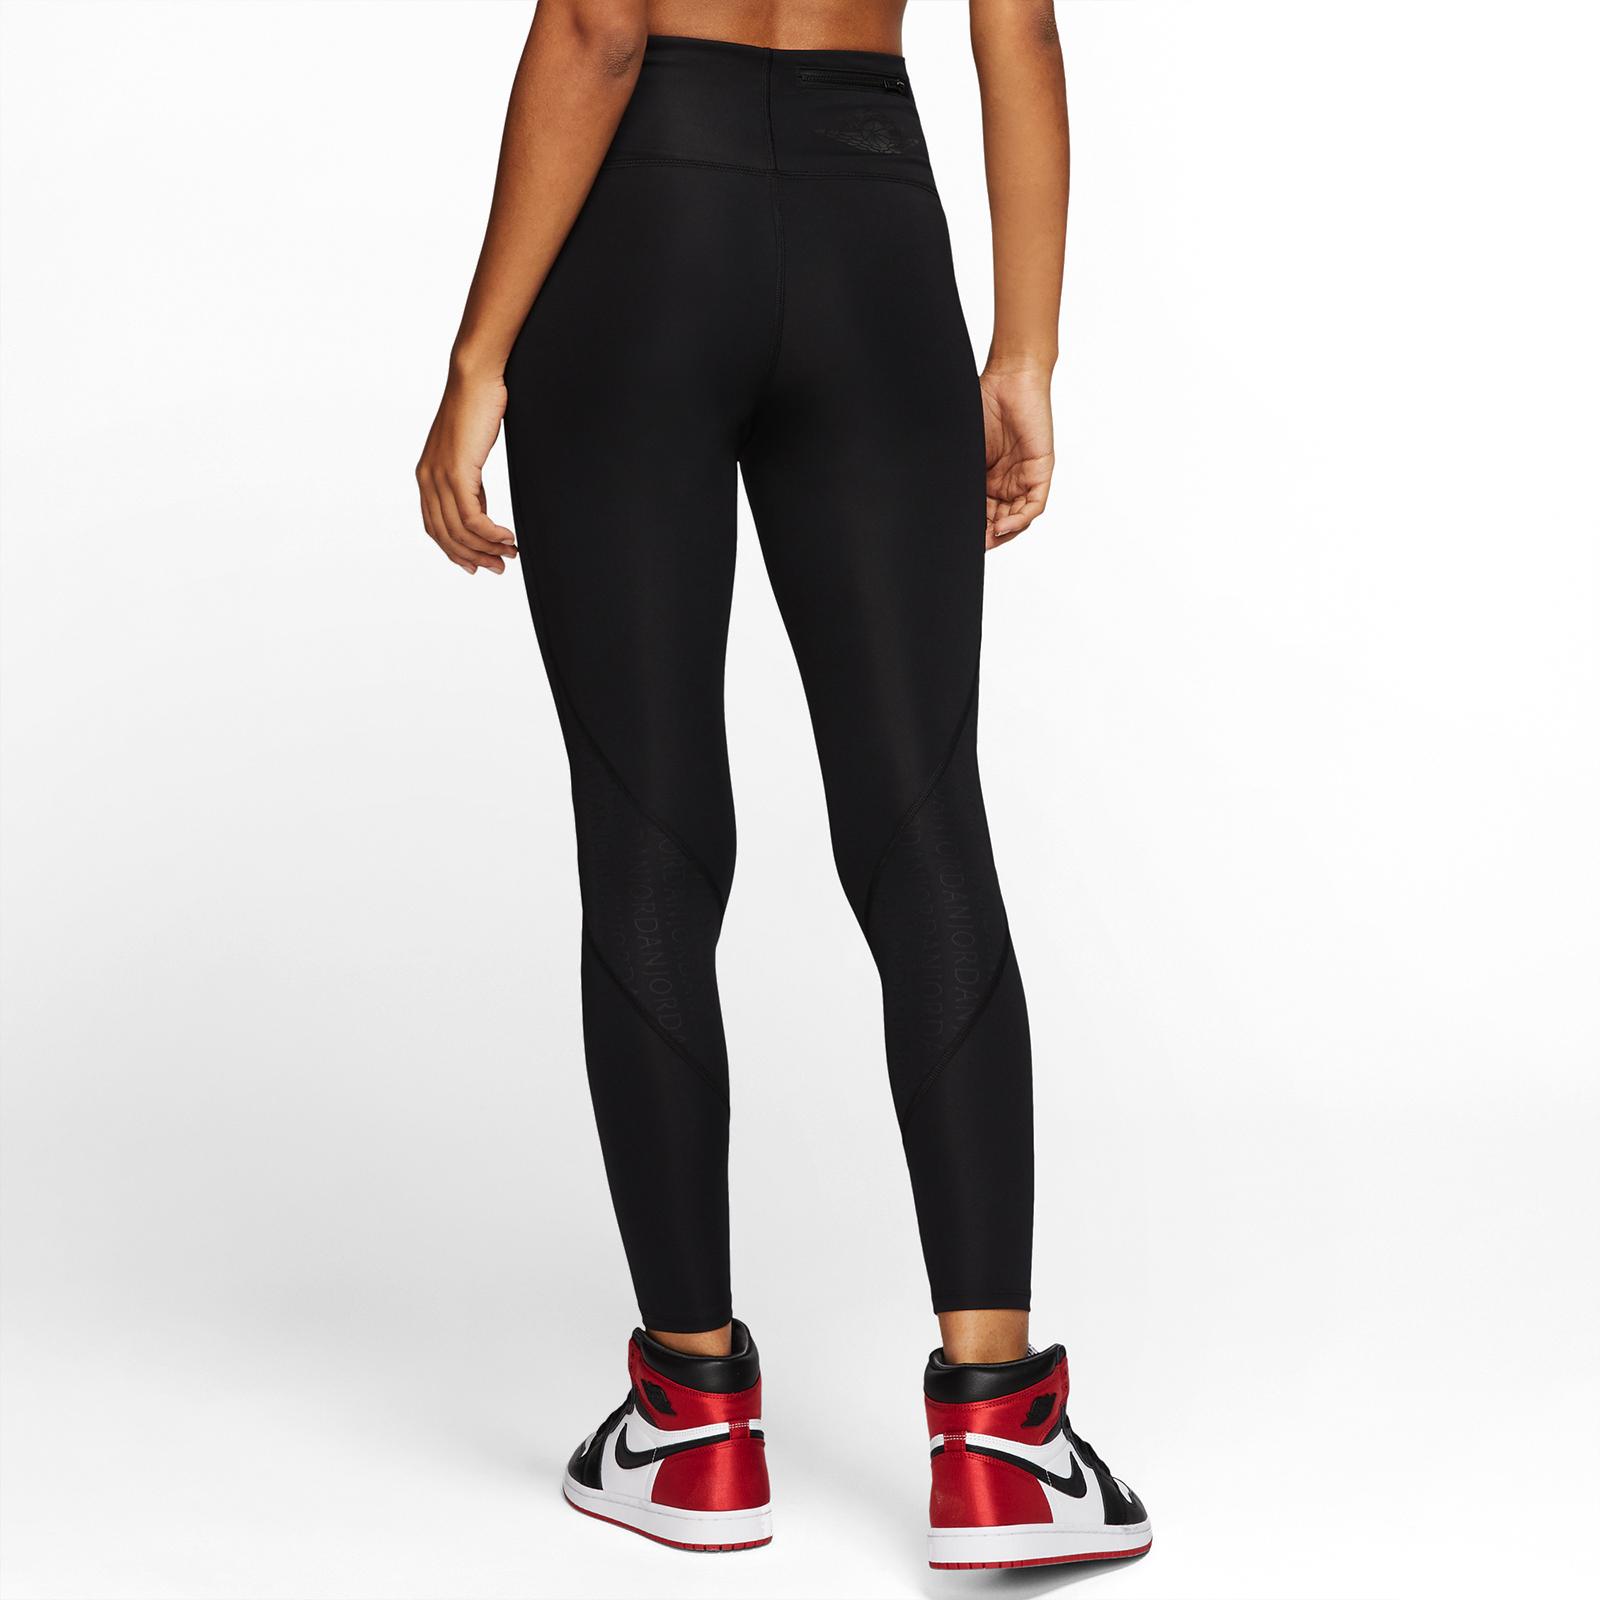 Jordan Brand Wmns Legging - Cq6675-010